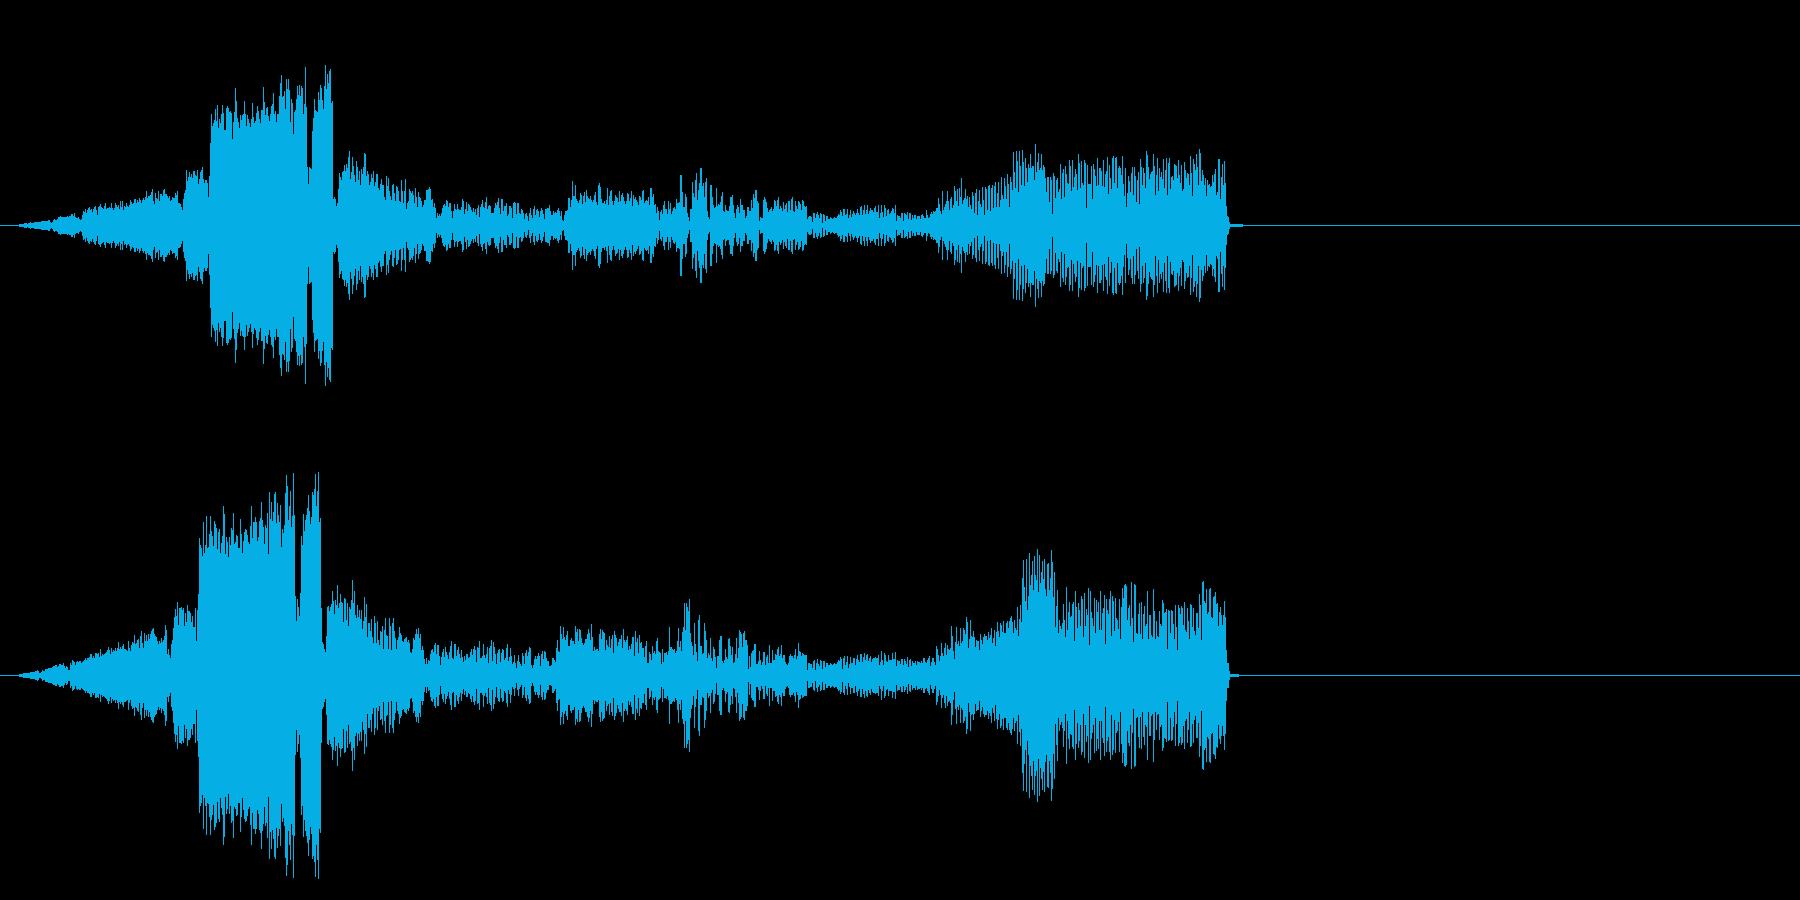 【SE ジングル】SF6の再生済みの波形